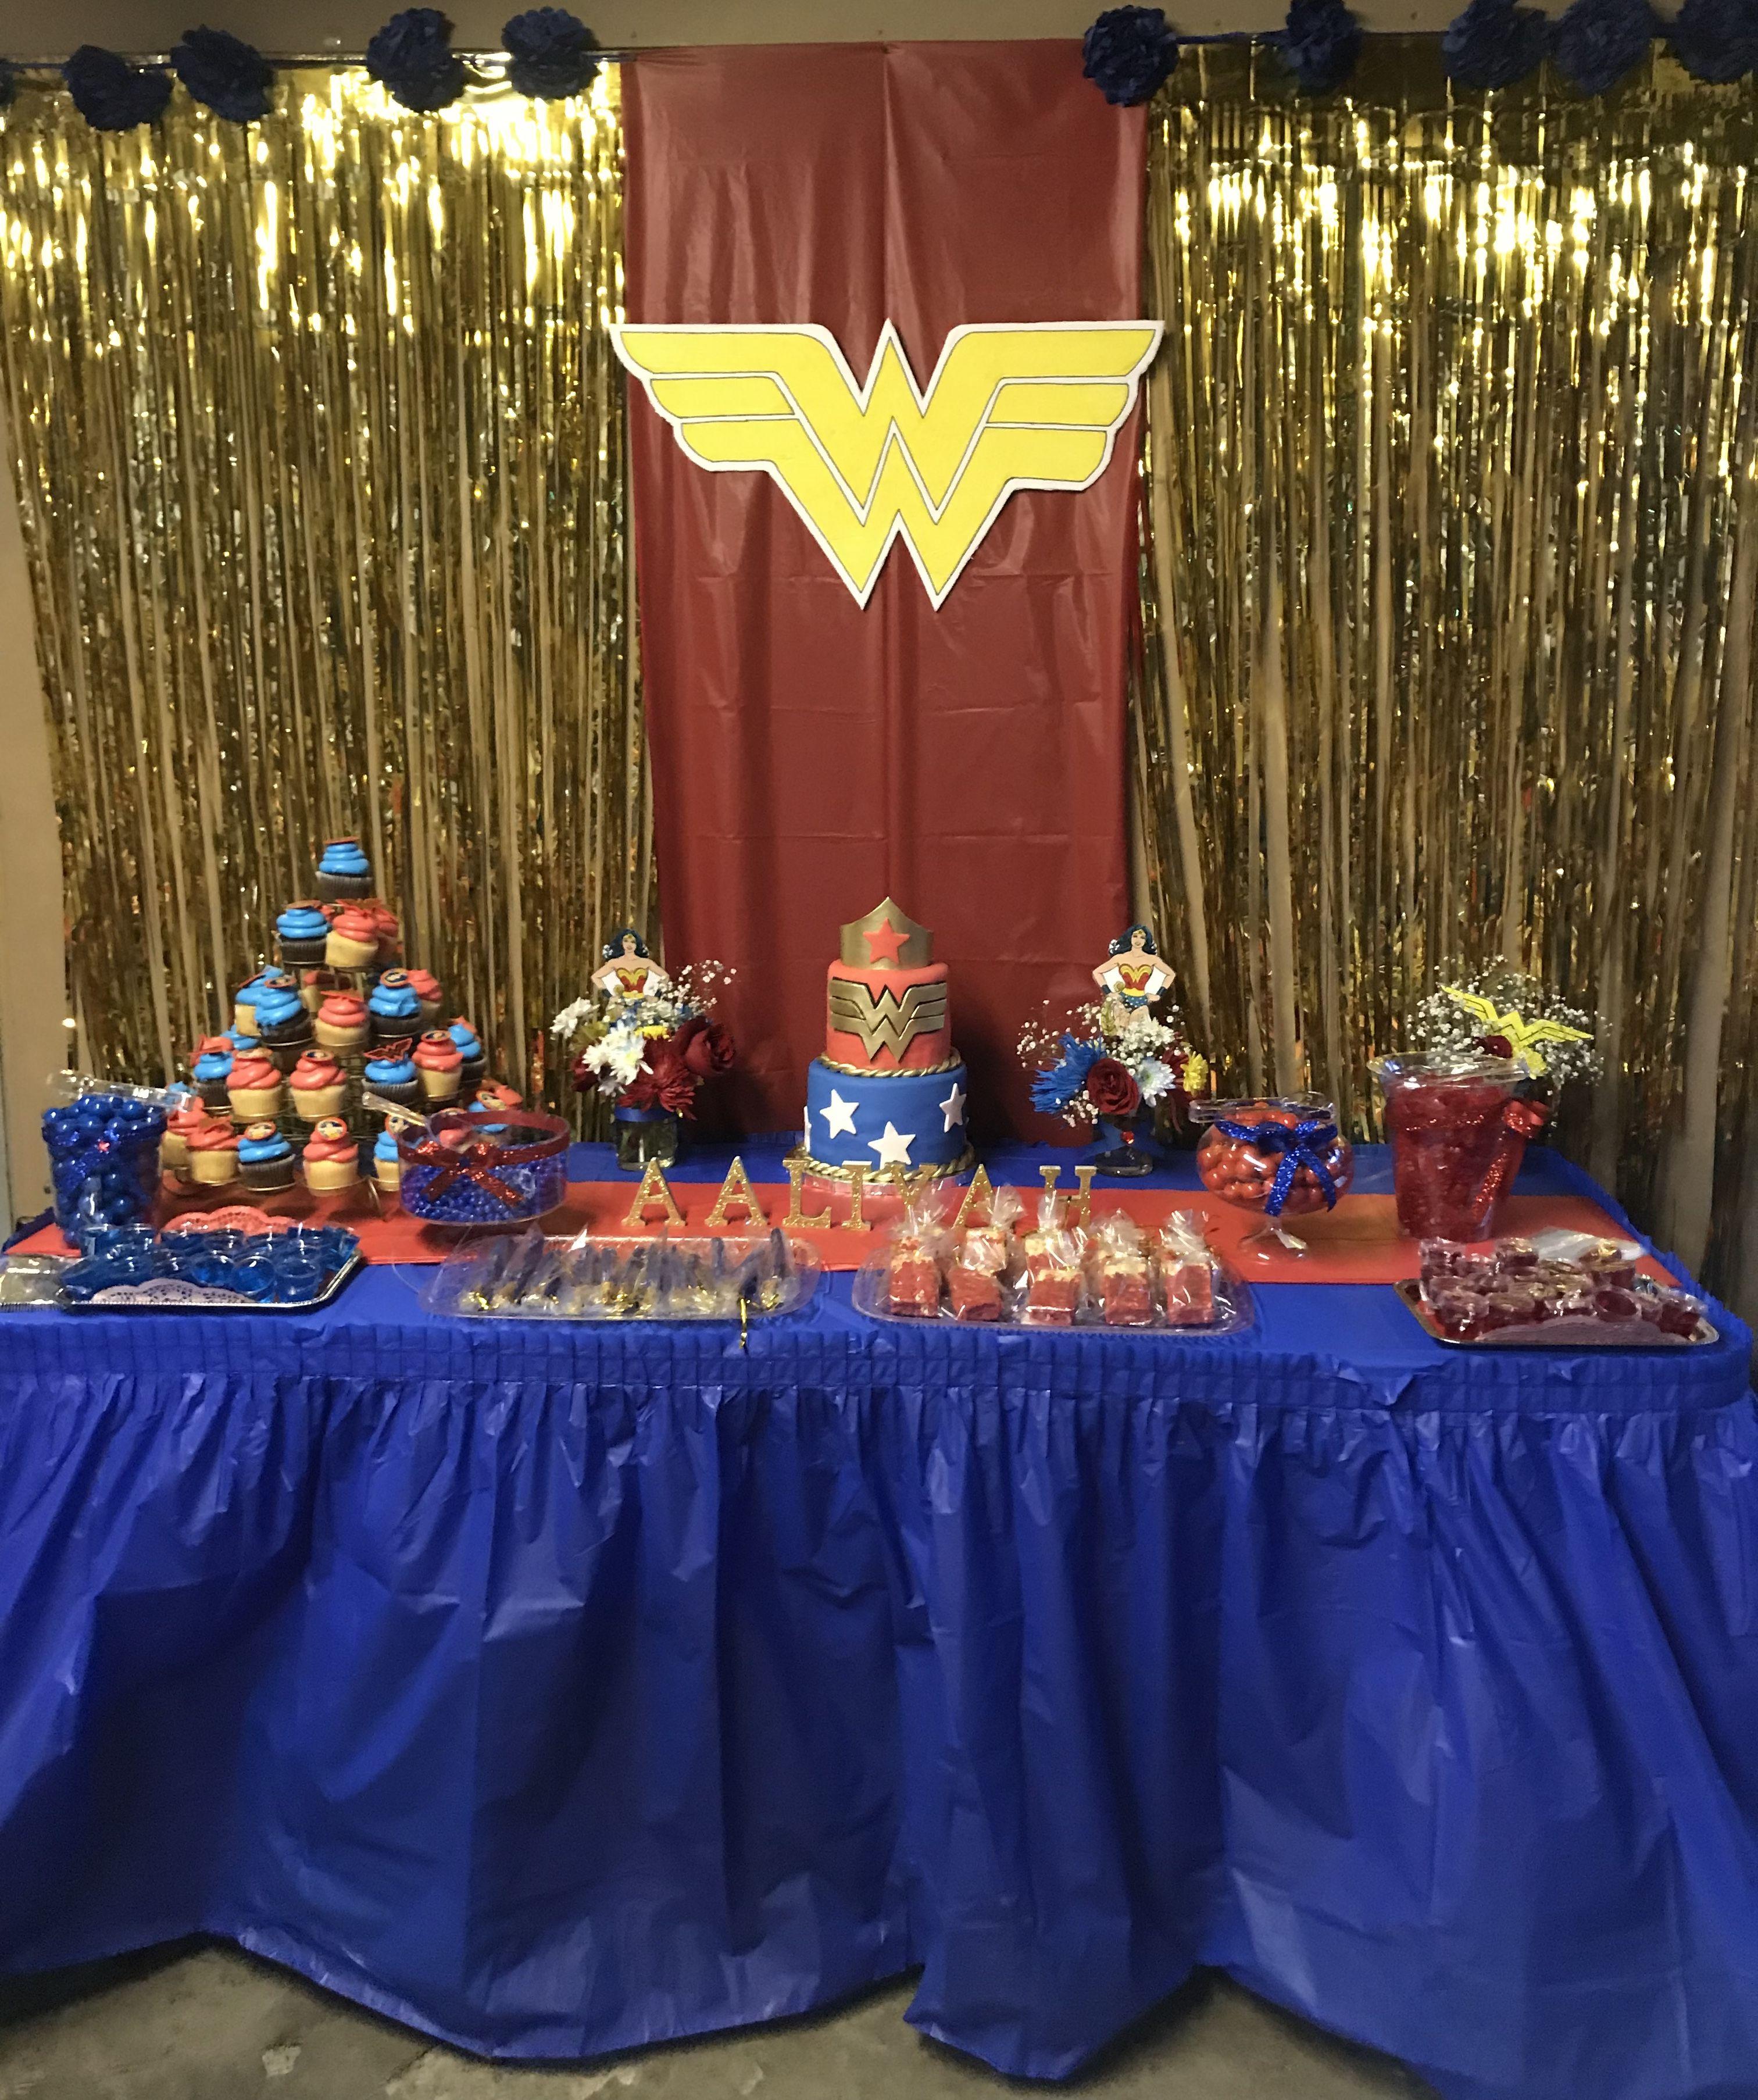 Wonder Woman Birthday Theme Party Handmade Budget Friendly Wonder Woman Birthday Party Woman Birthday Party Wonder Woman Party